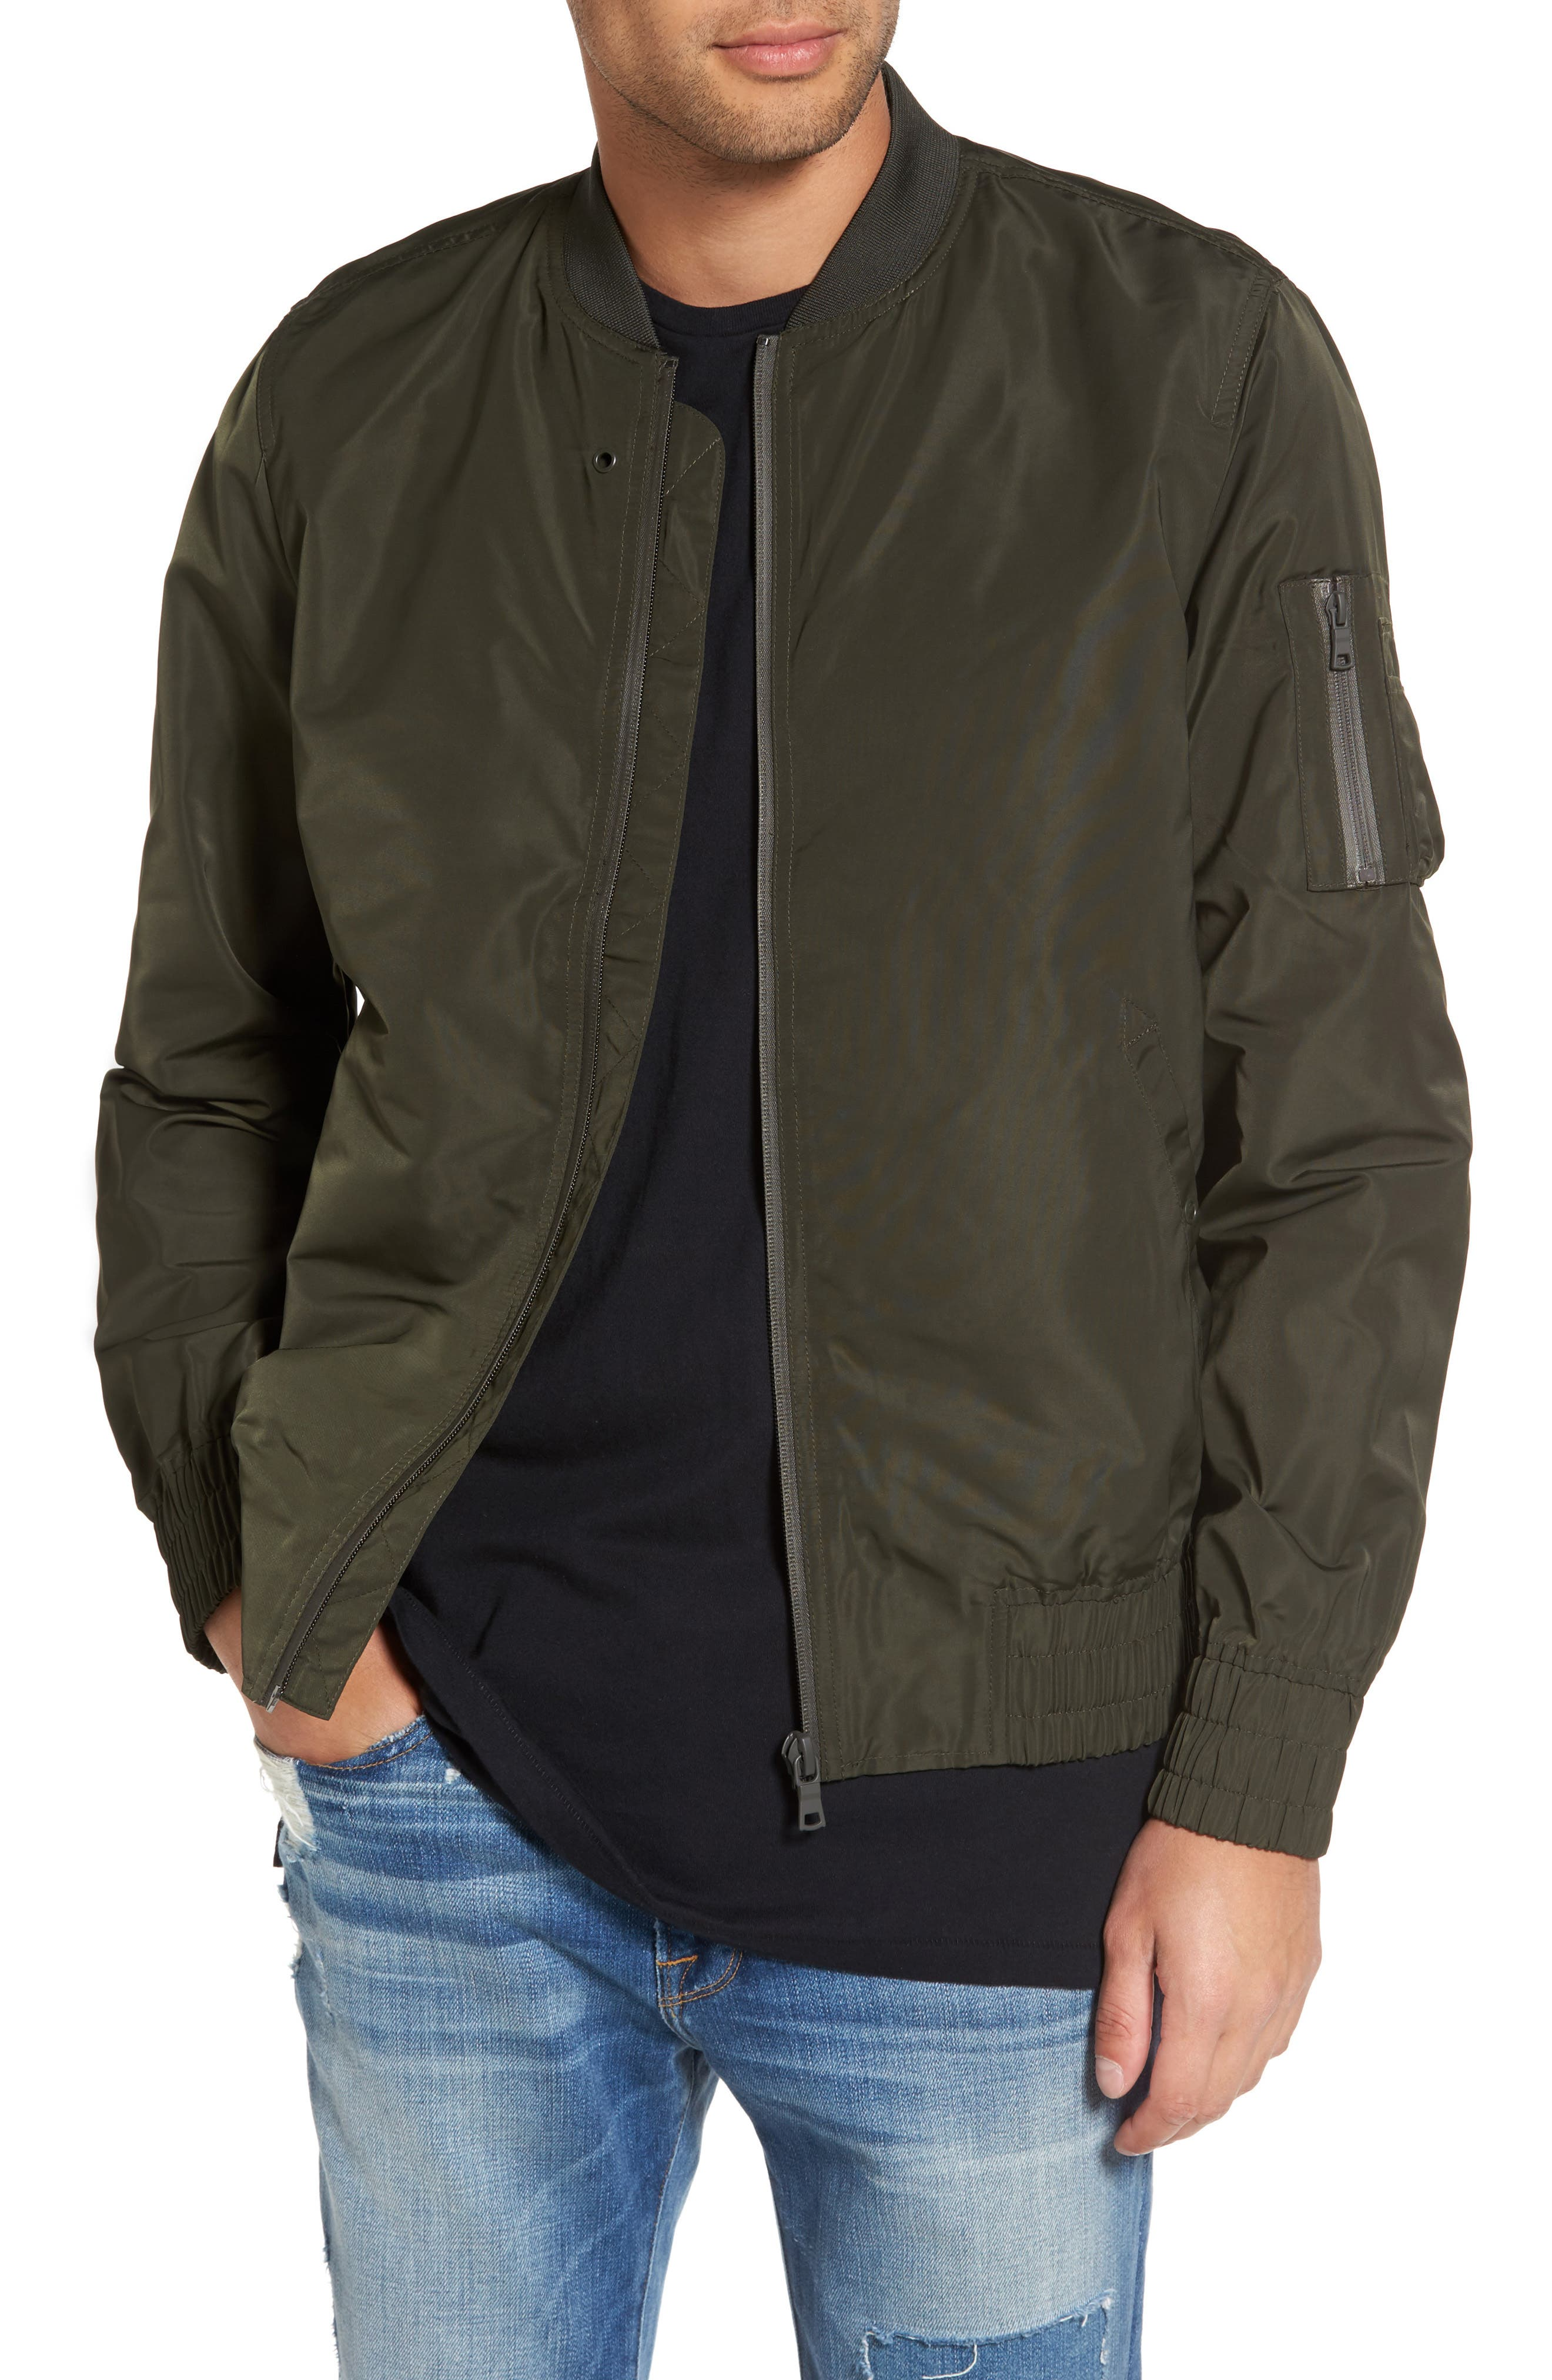 Alternate Image 1 Selected - Topman Elton Bomber Jacket